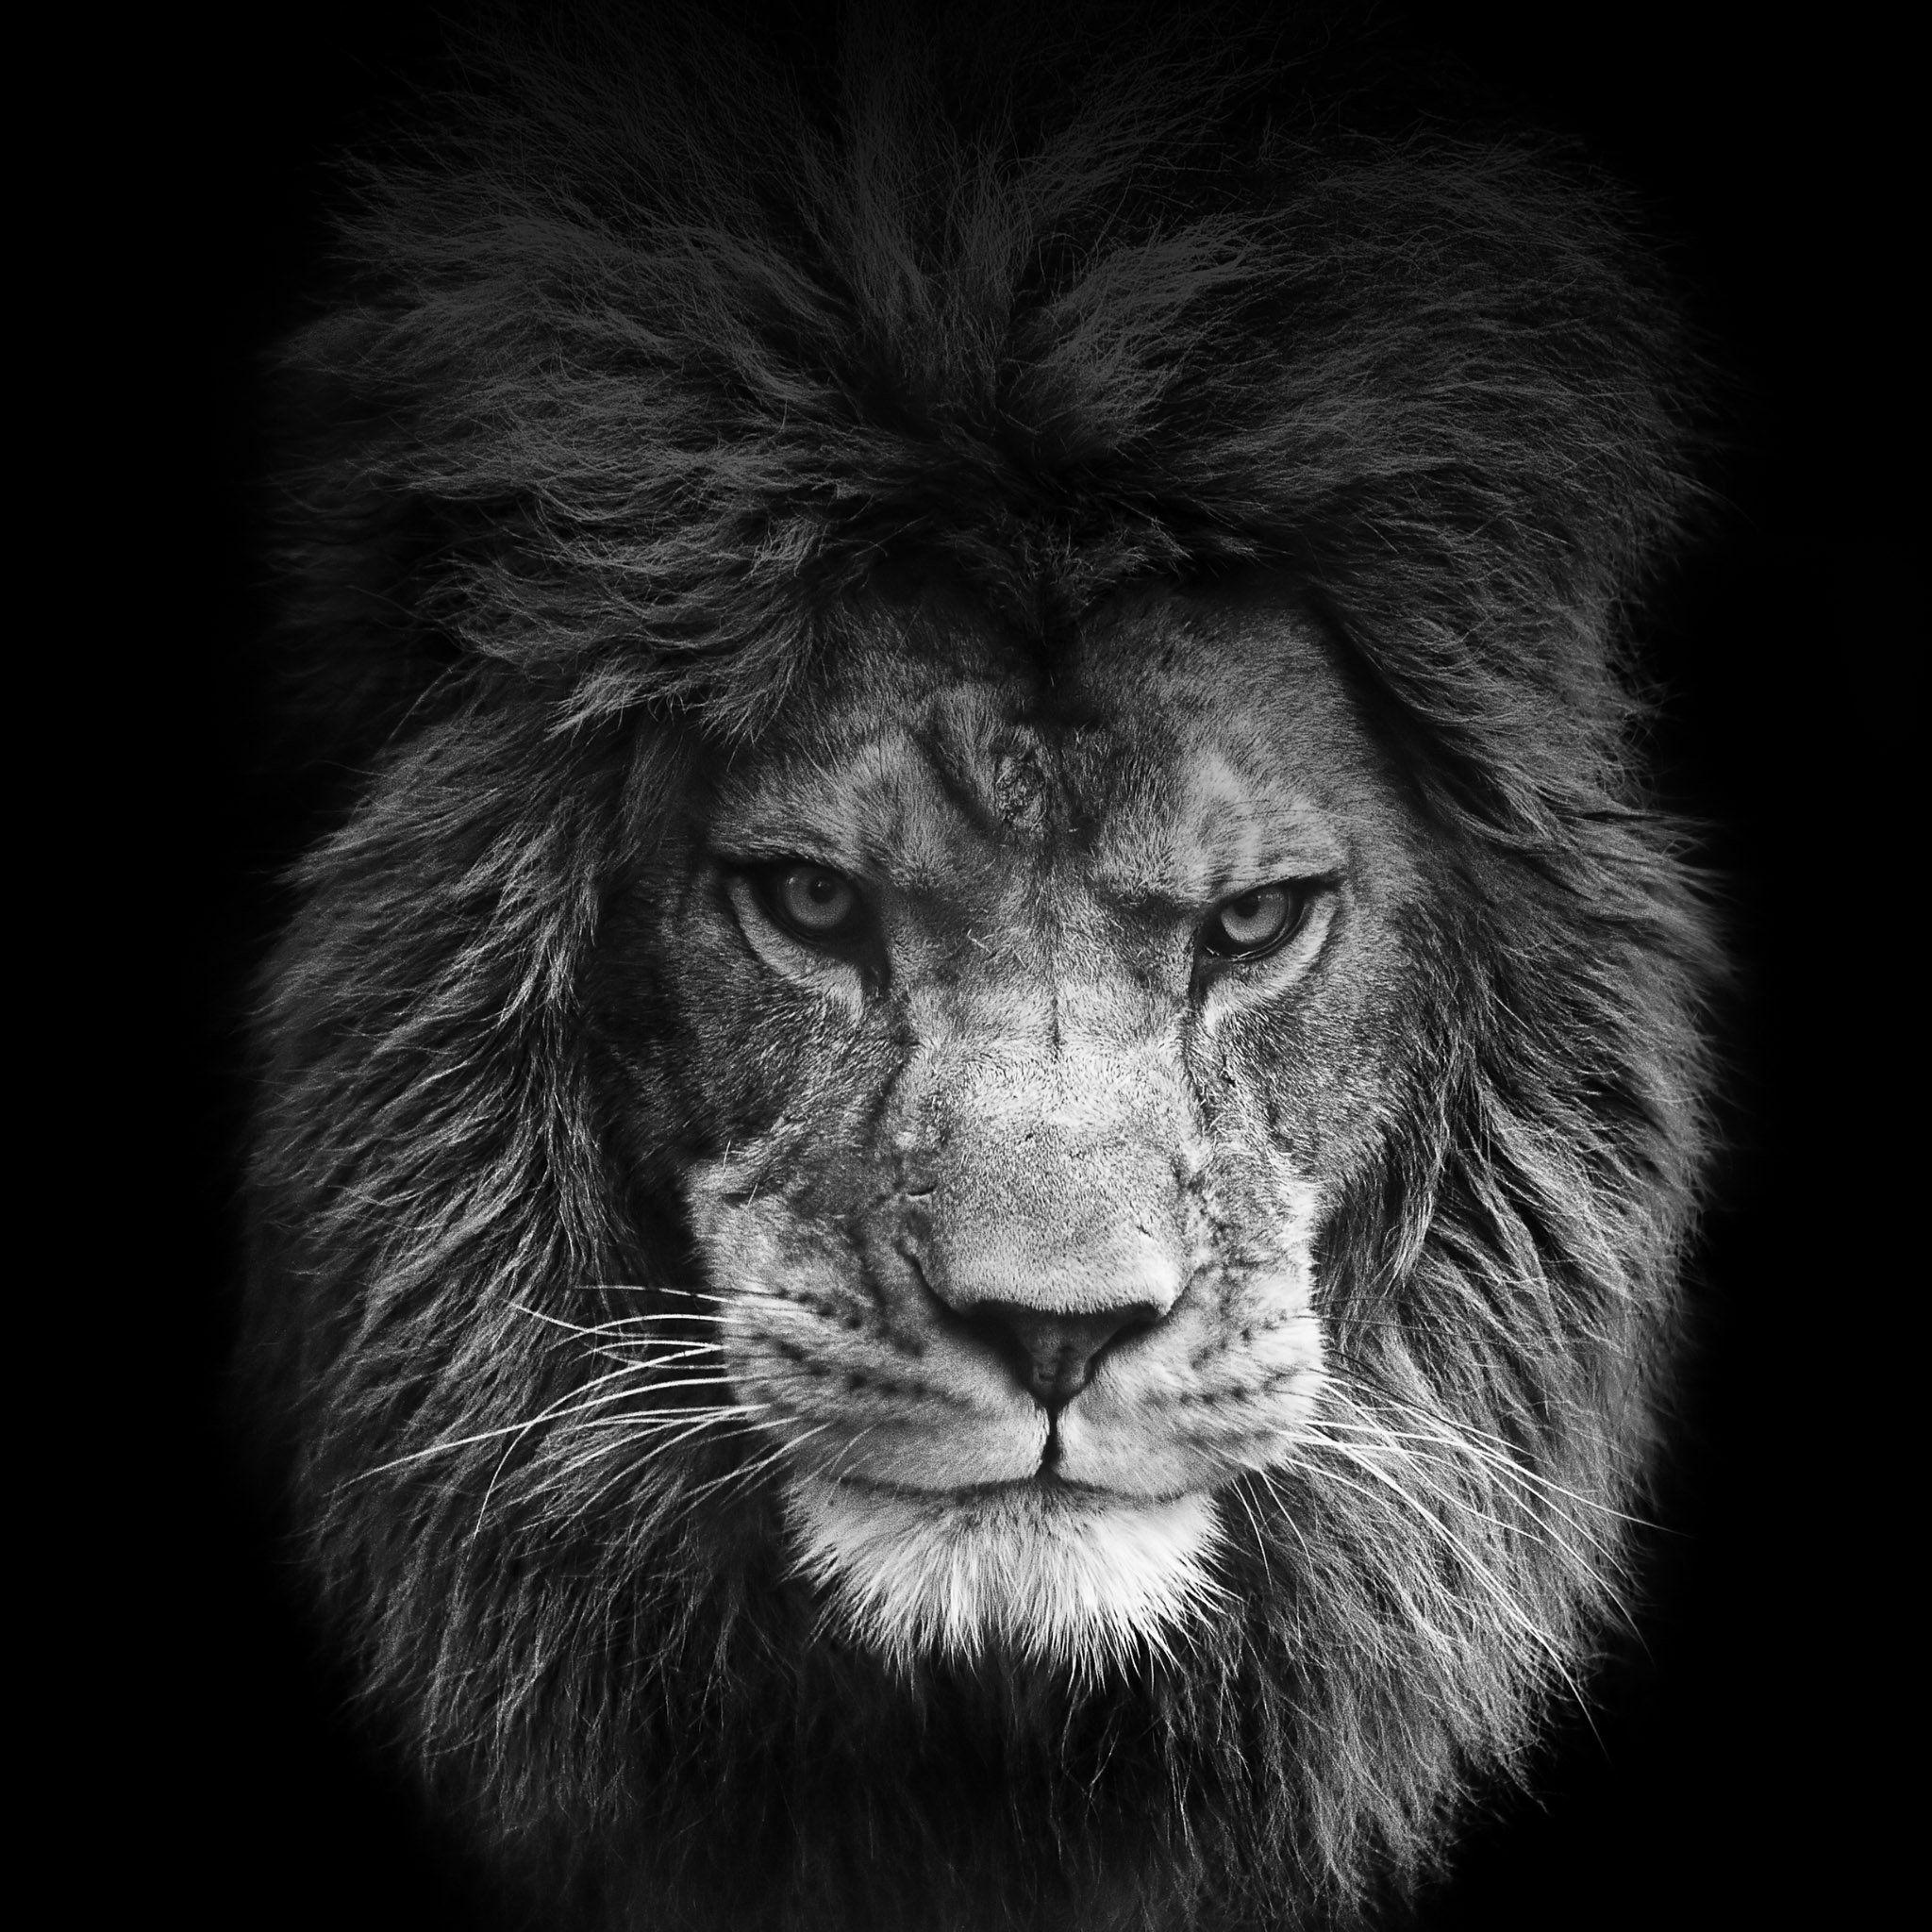 Free Download Lion Roar Iphone Wallpaper Wallpapers Background For Desktop Mobile Tablet 2048x2048 Lion Wallpaper Lion Photography Lion Wallpaper Iphone